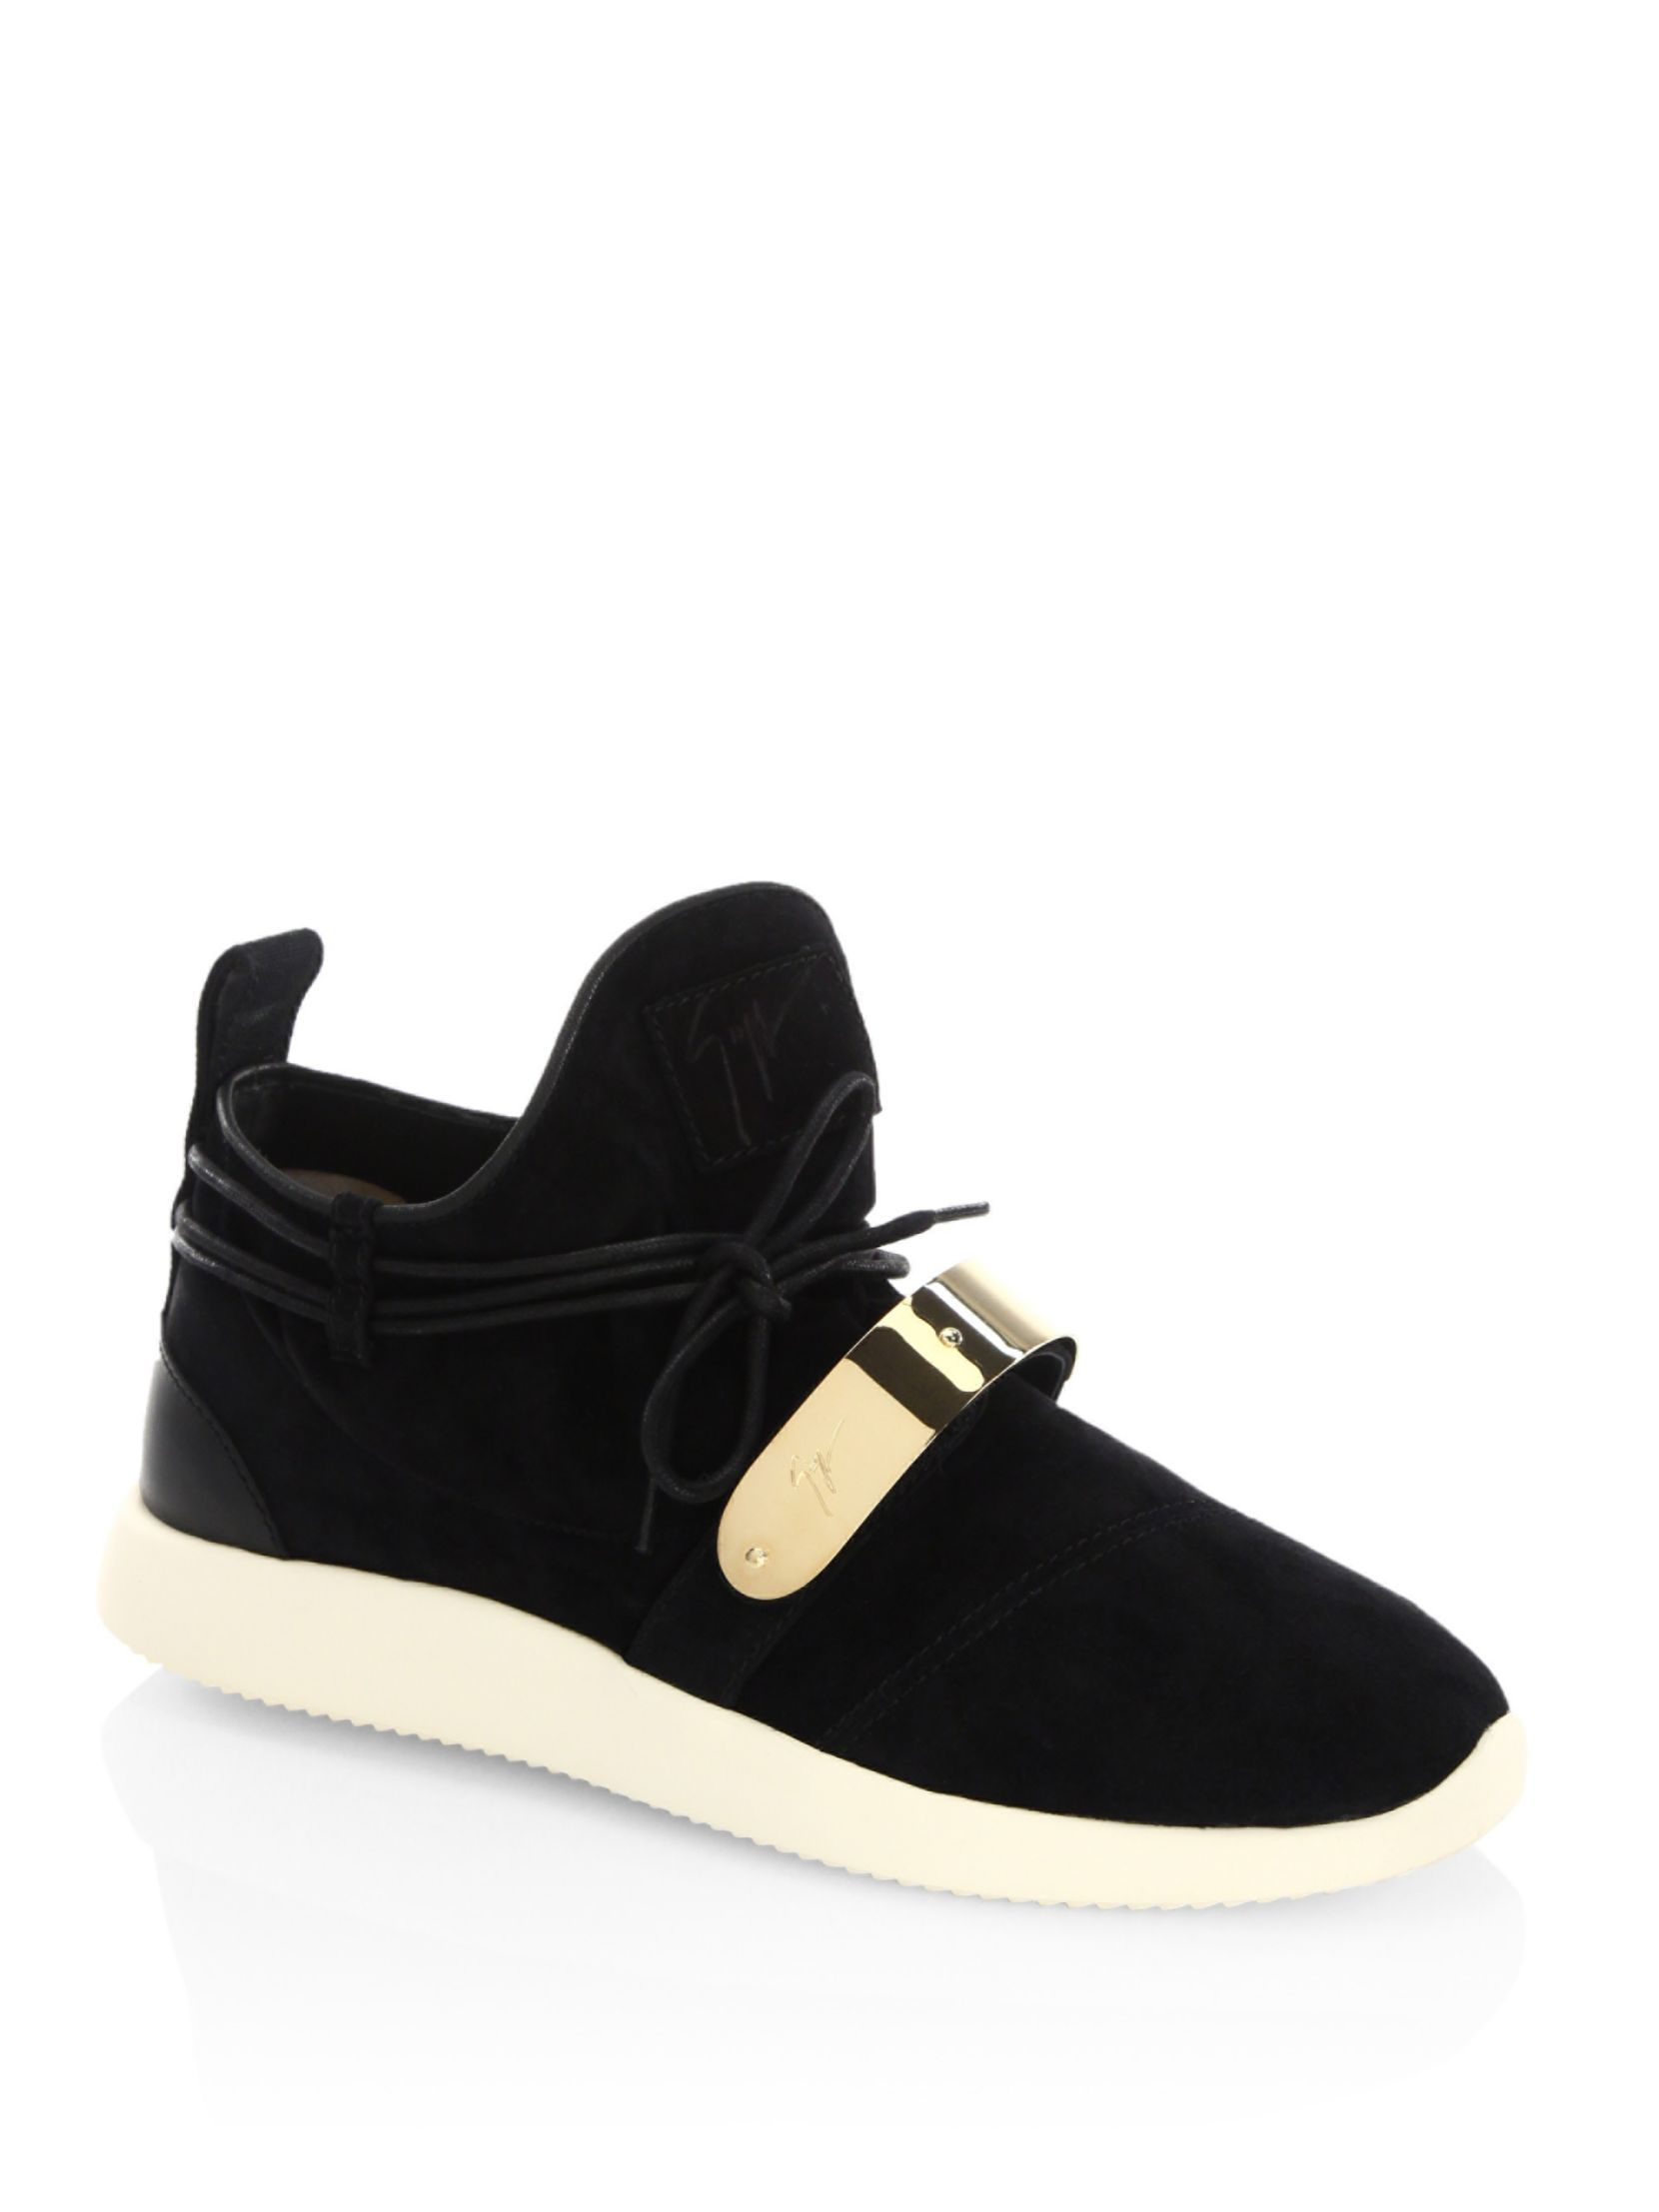 Giuseppe Zanotti Suede Singleg Sneakers QfVZv